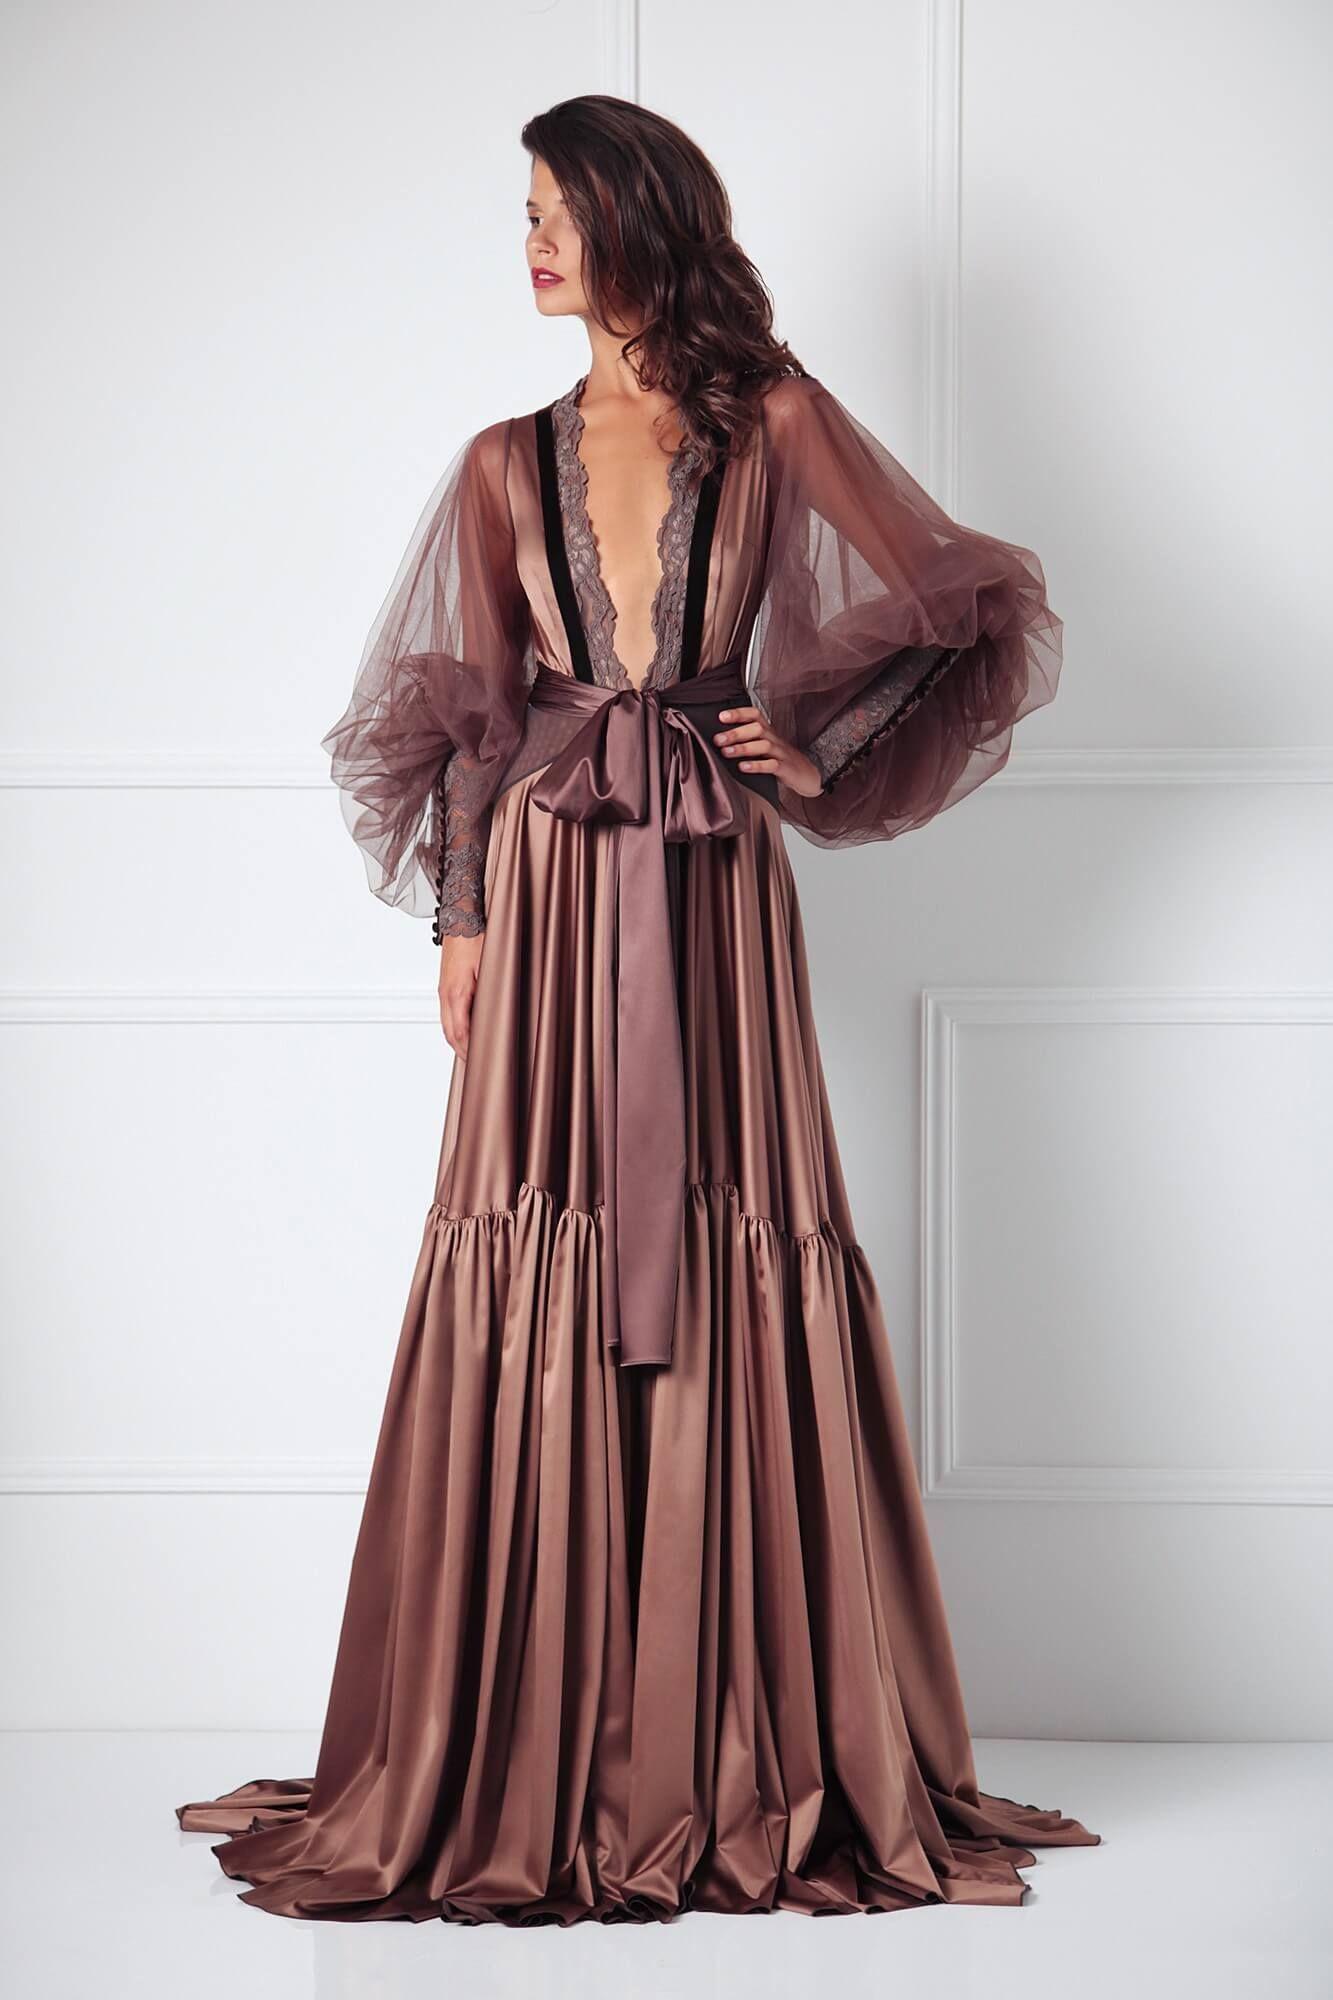 Amoralle Magnum brown satin puff sleeve robe